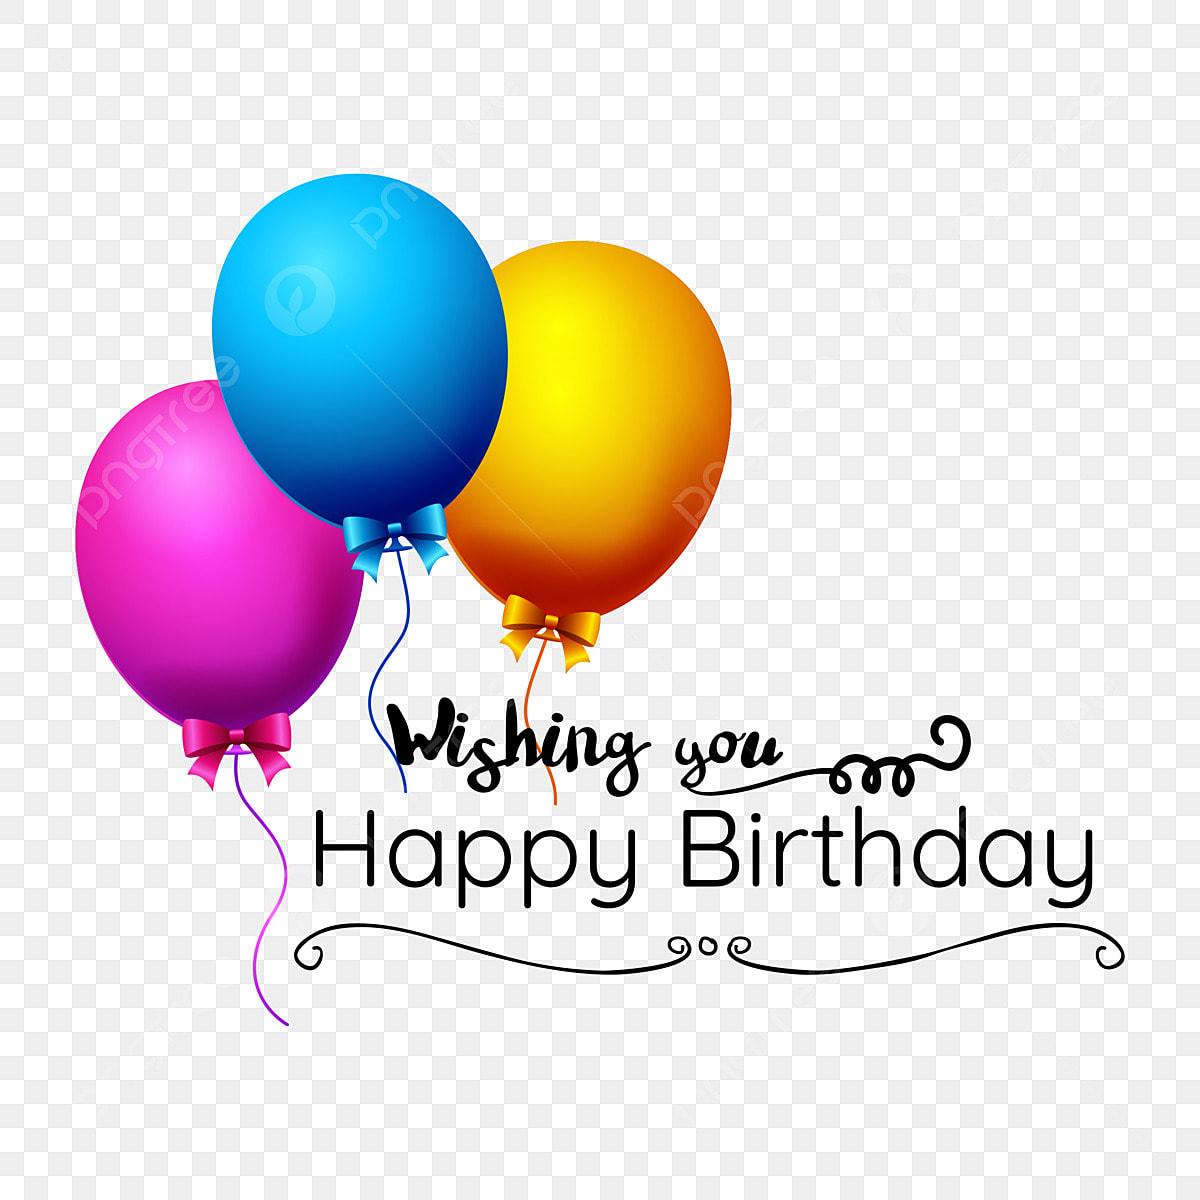 Balloon Birthday Greeting Card Label, Birthday, Card, Happy PNG